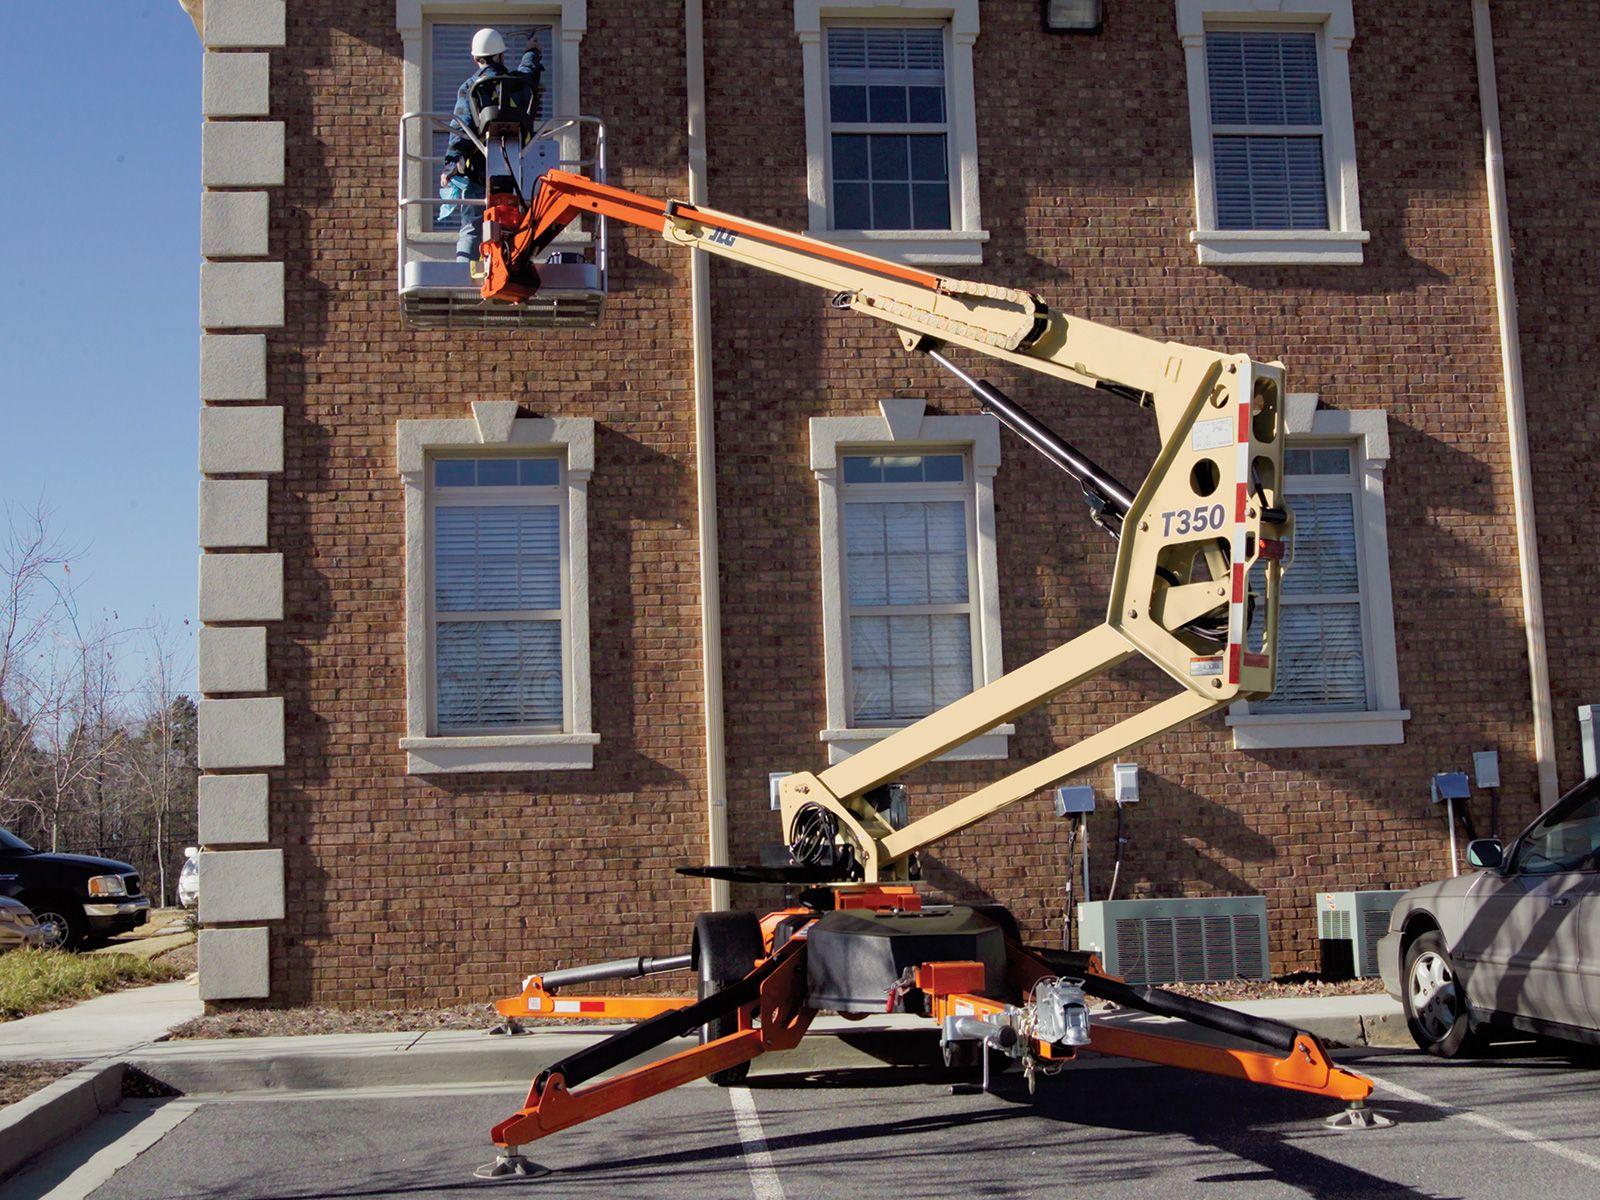 Hydraulic Towable Lift Lift Design Hydraulic Boom Lift